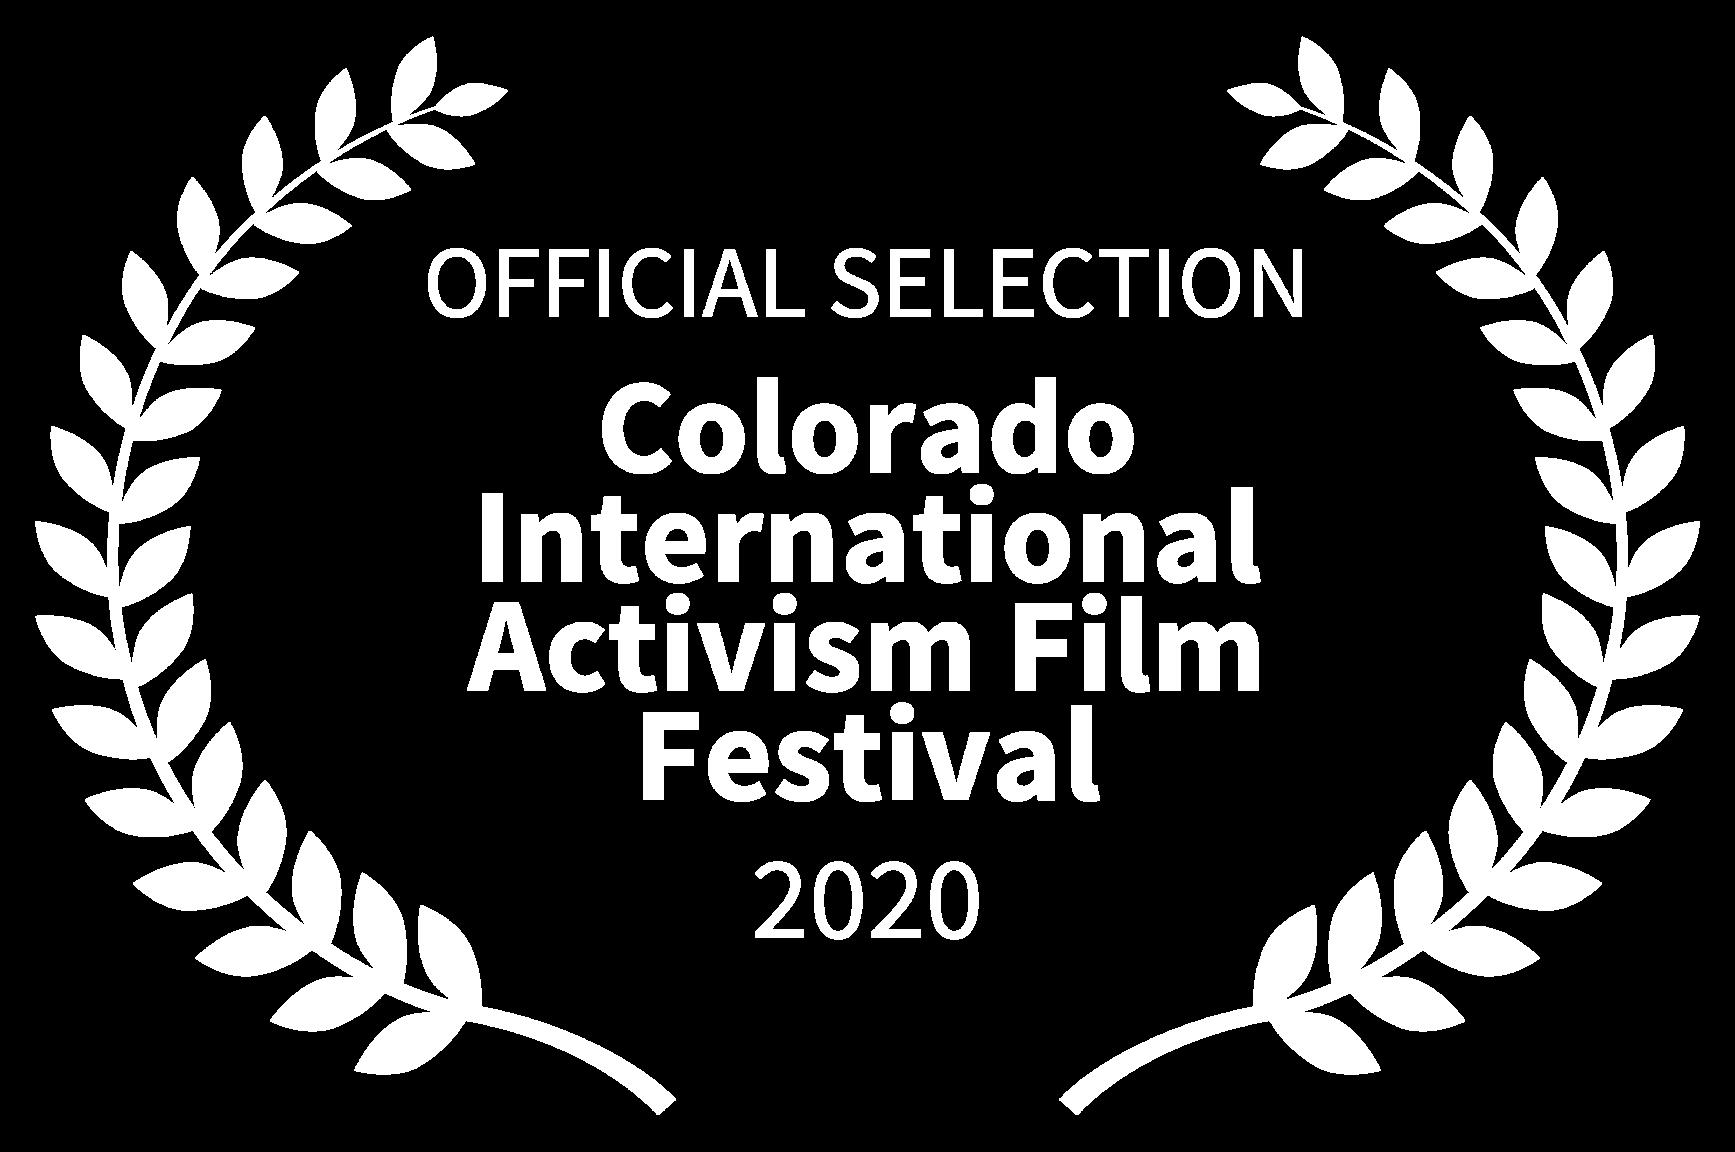 OFFICIAL-SELECTION-Colorado-International-Activism-Film-Festival-2020-1